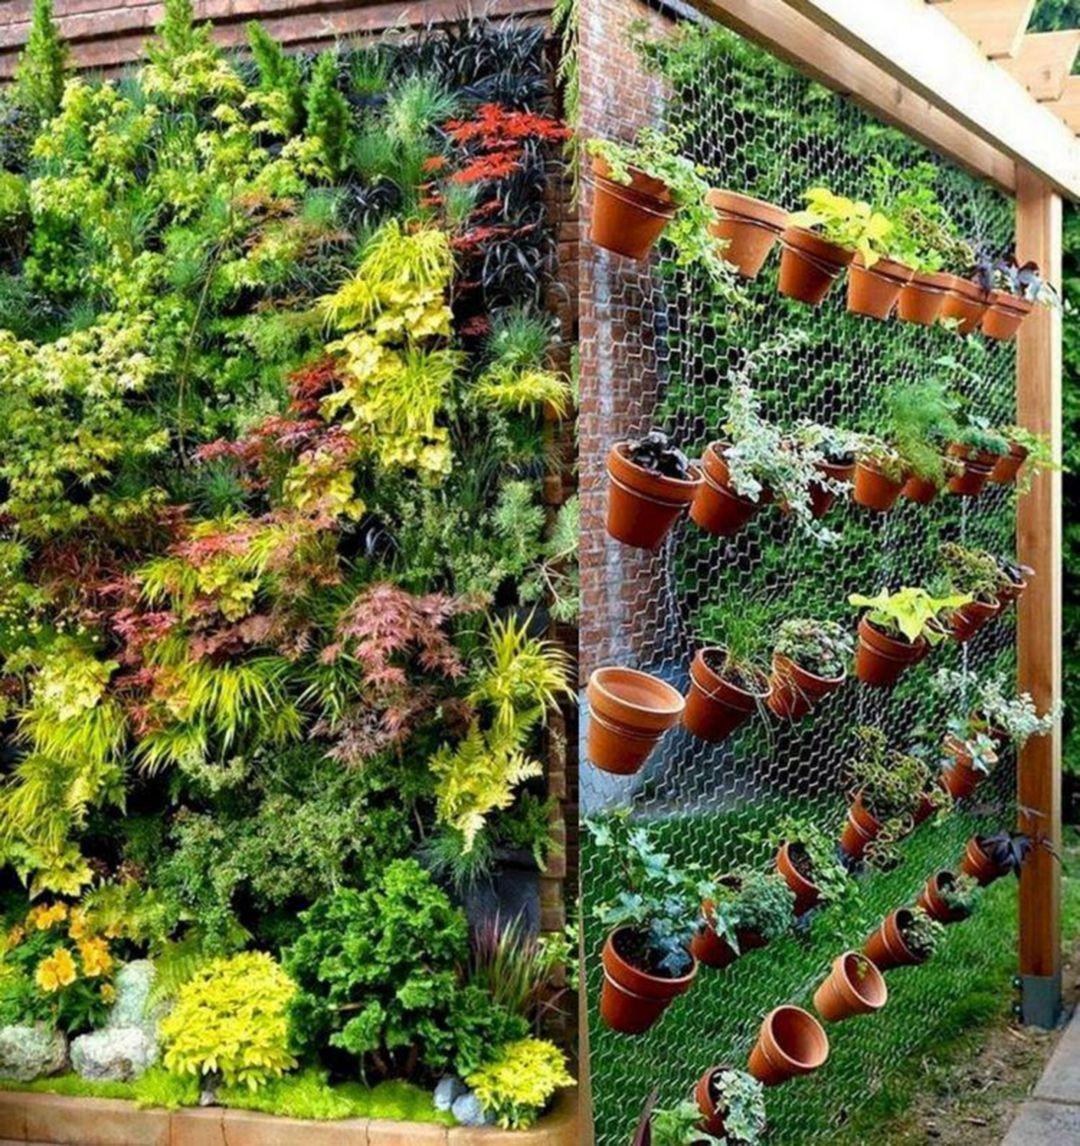 20 Amazing Vertical Garden Ideas To Beautify Your Home Ideas Https Pistoncars Com 20 Amazing Verti Vertical Garden Diy Vertical Garden Vertical Garden Indoor